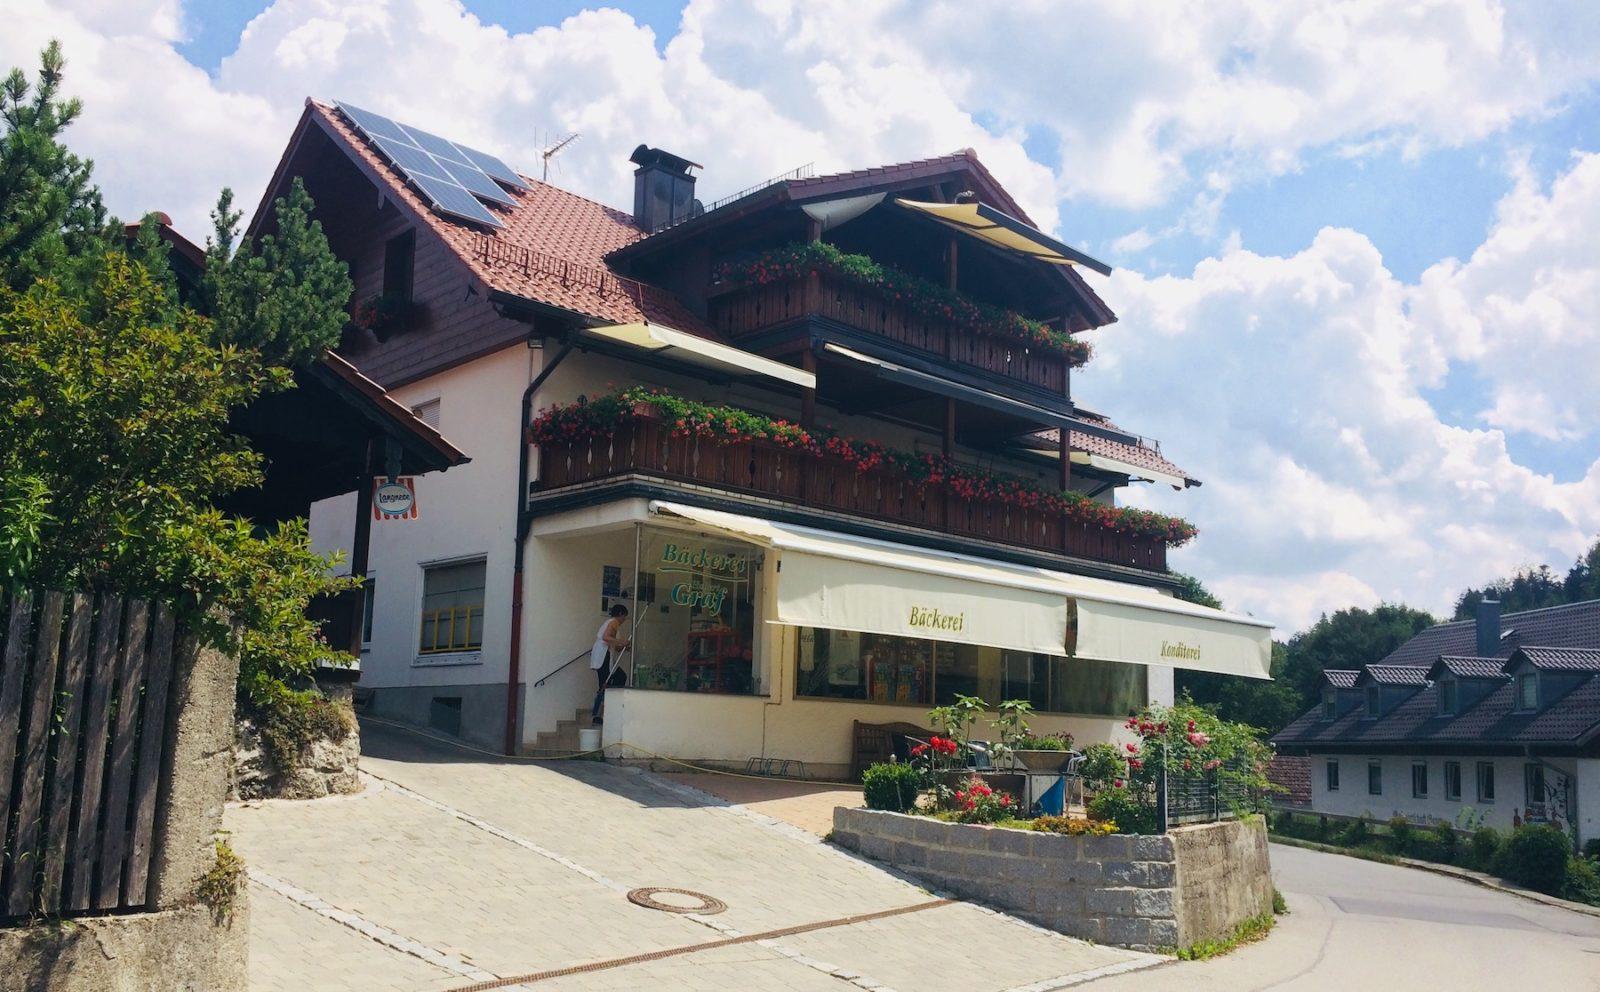 Ausflug: Huber & Staller Drehorte in Wolfratshausen, Münsing usw.